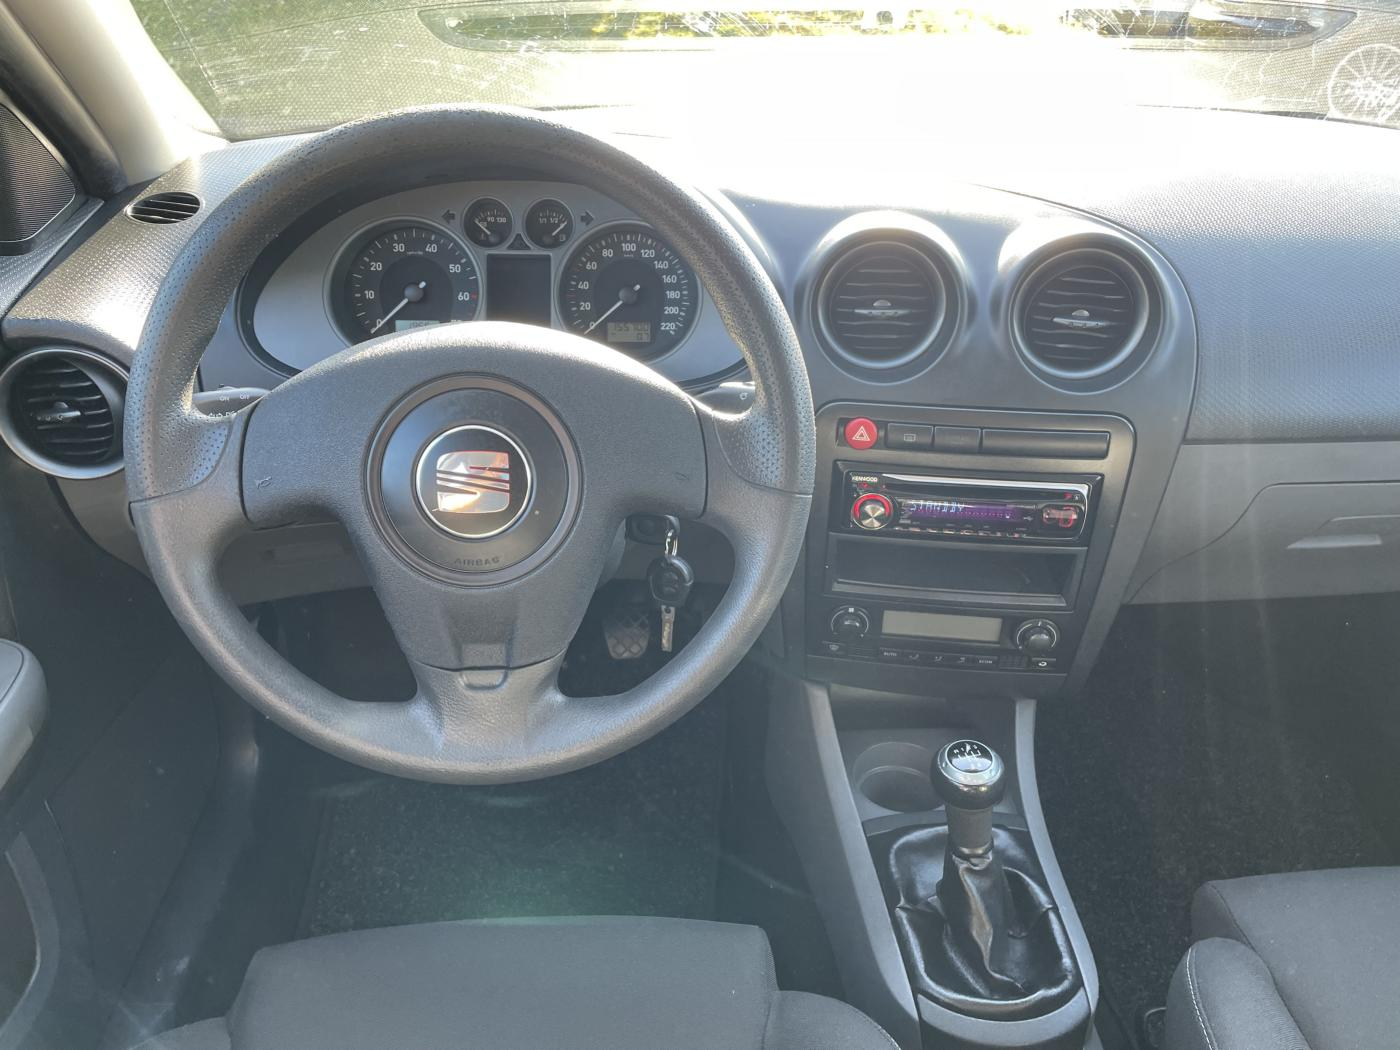 Seat Ibiza 1.2i